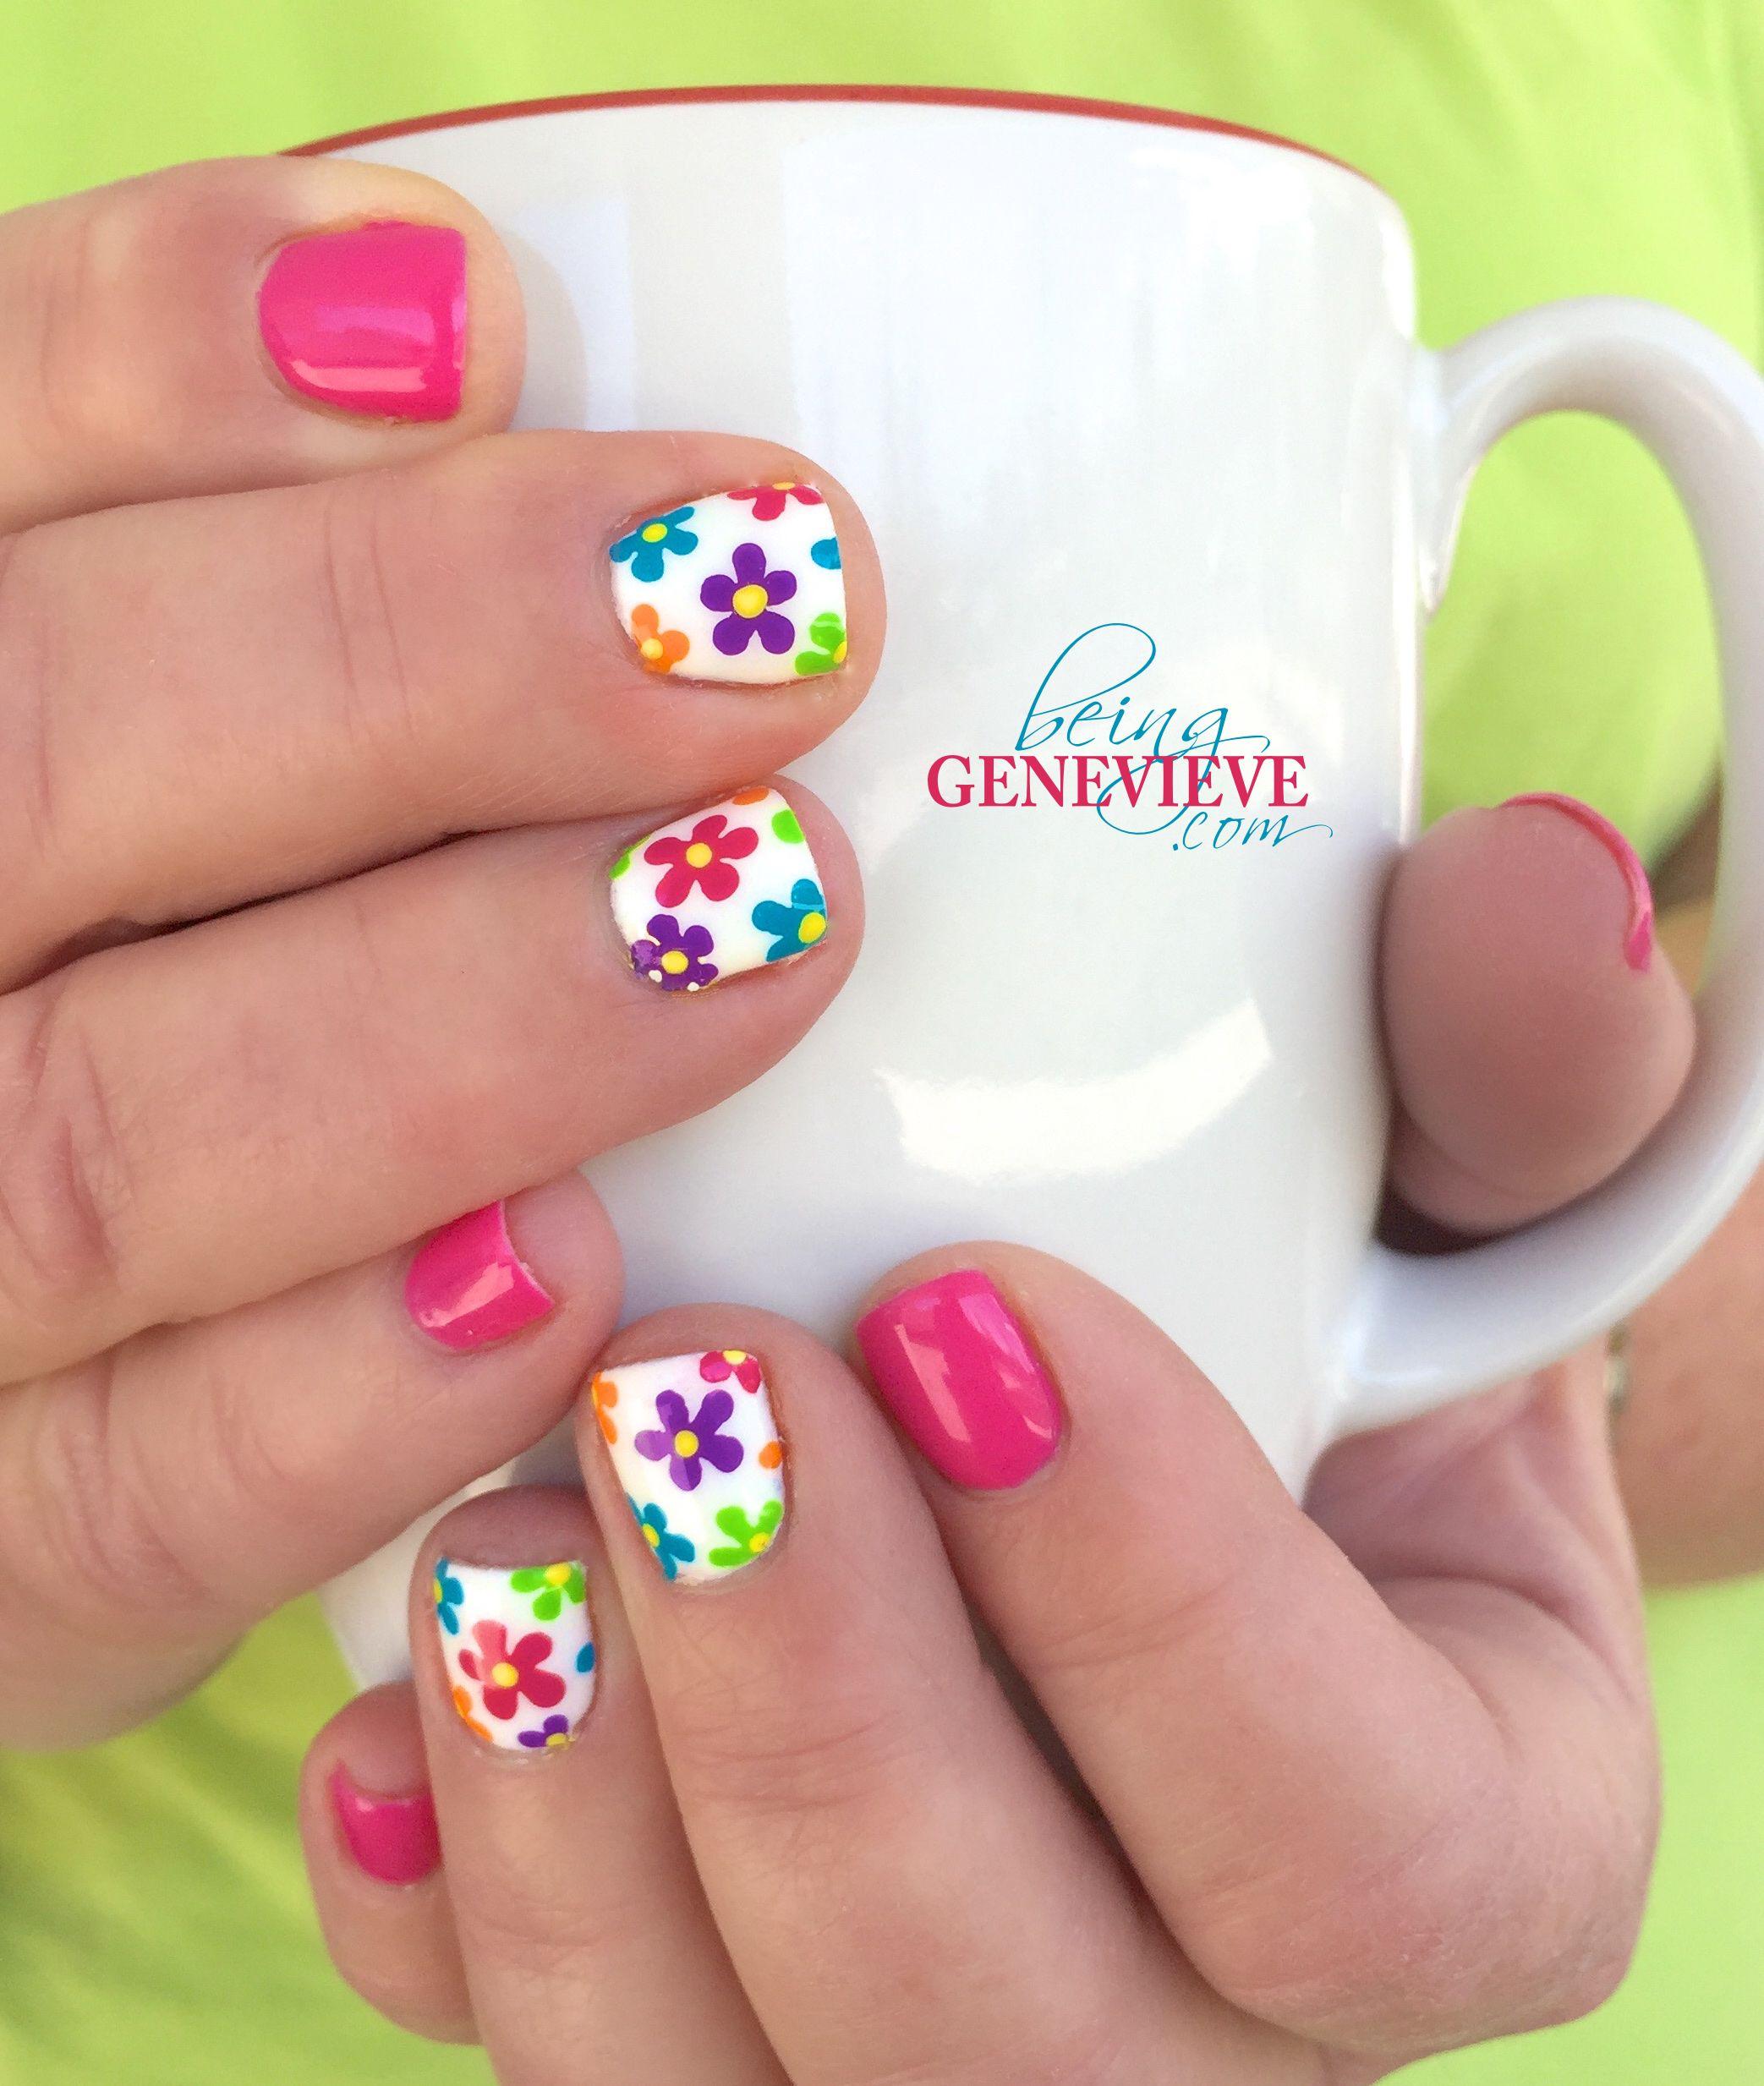 Summer Glimpse | Fun nails, Manicure and Bright